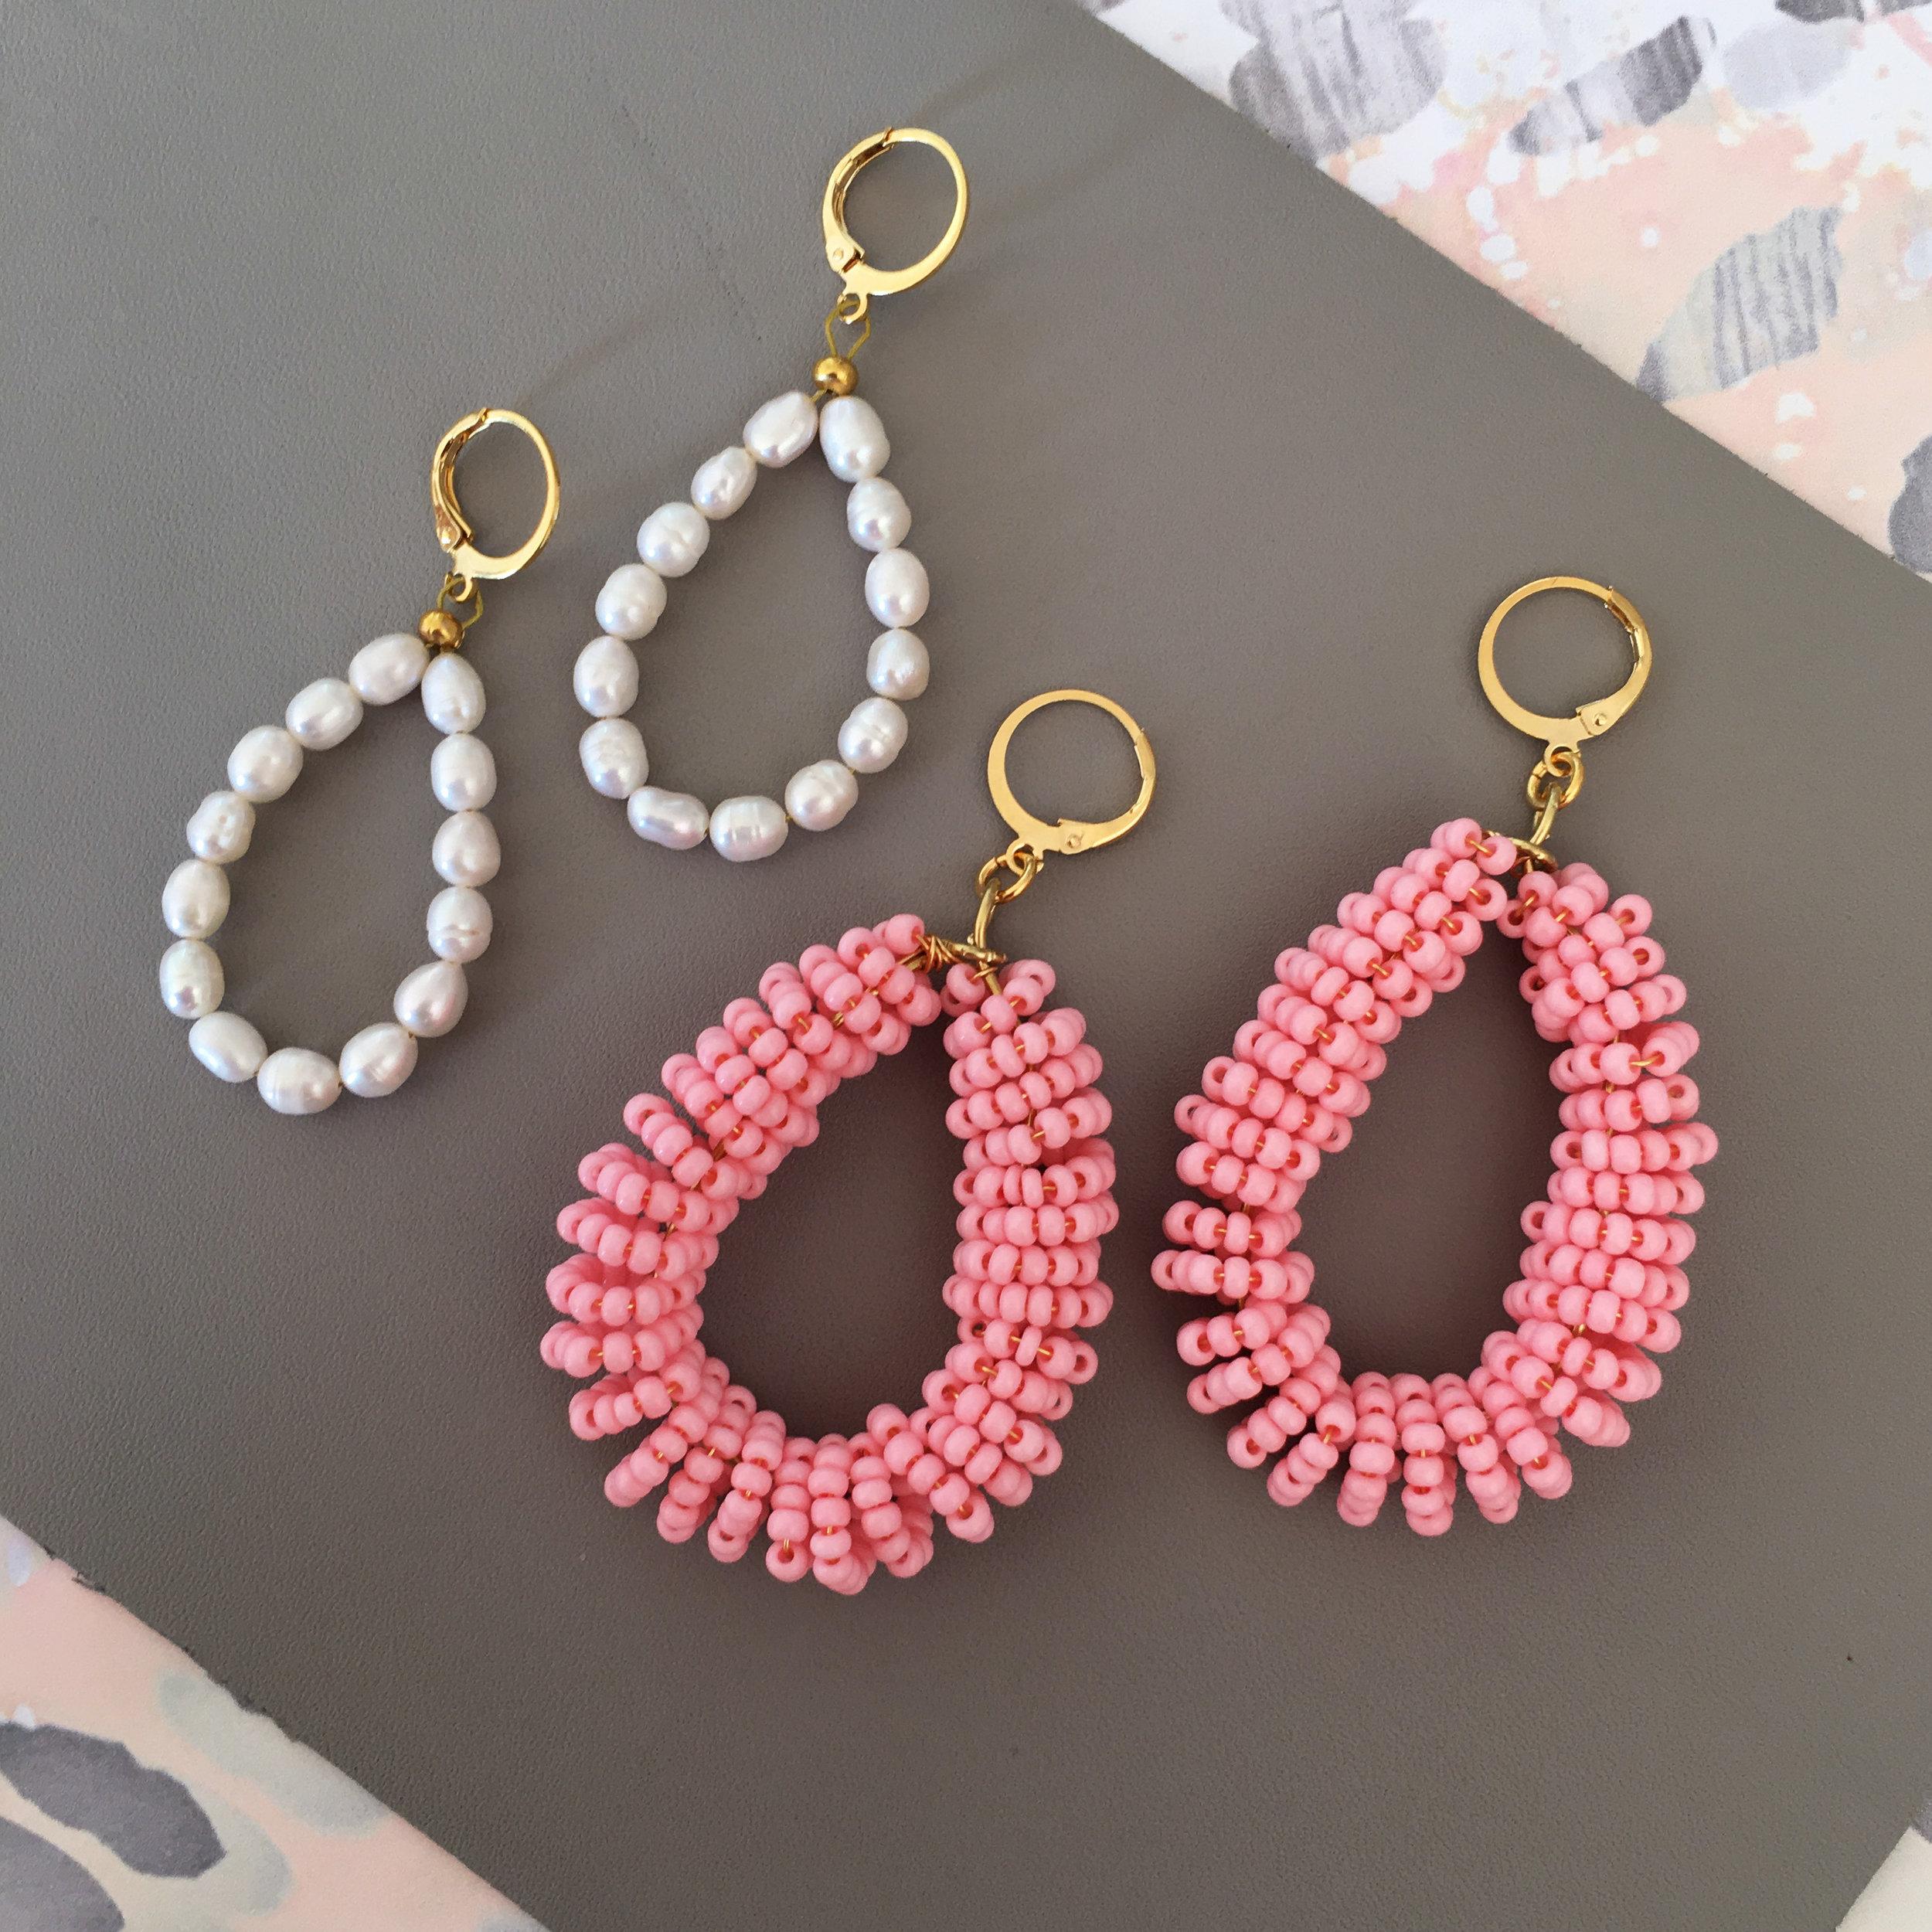 Pink candy earrings.jpg